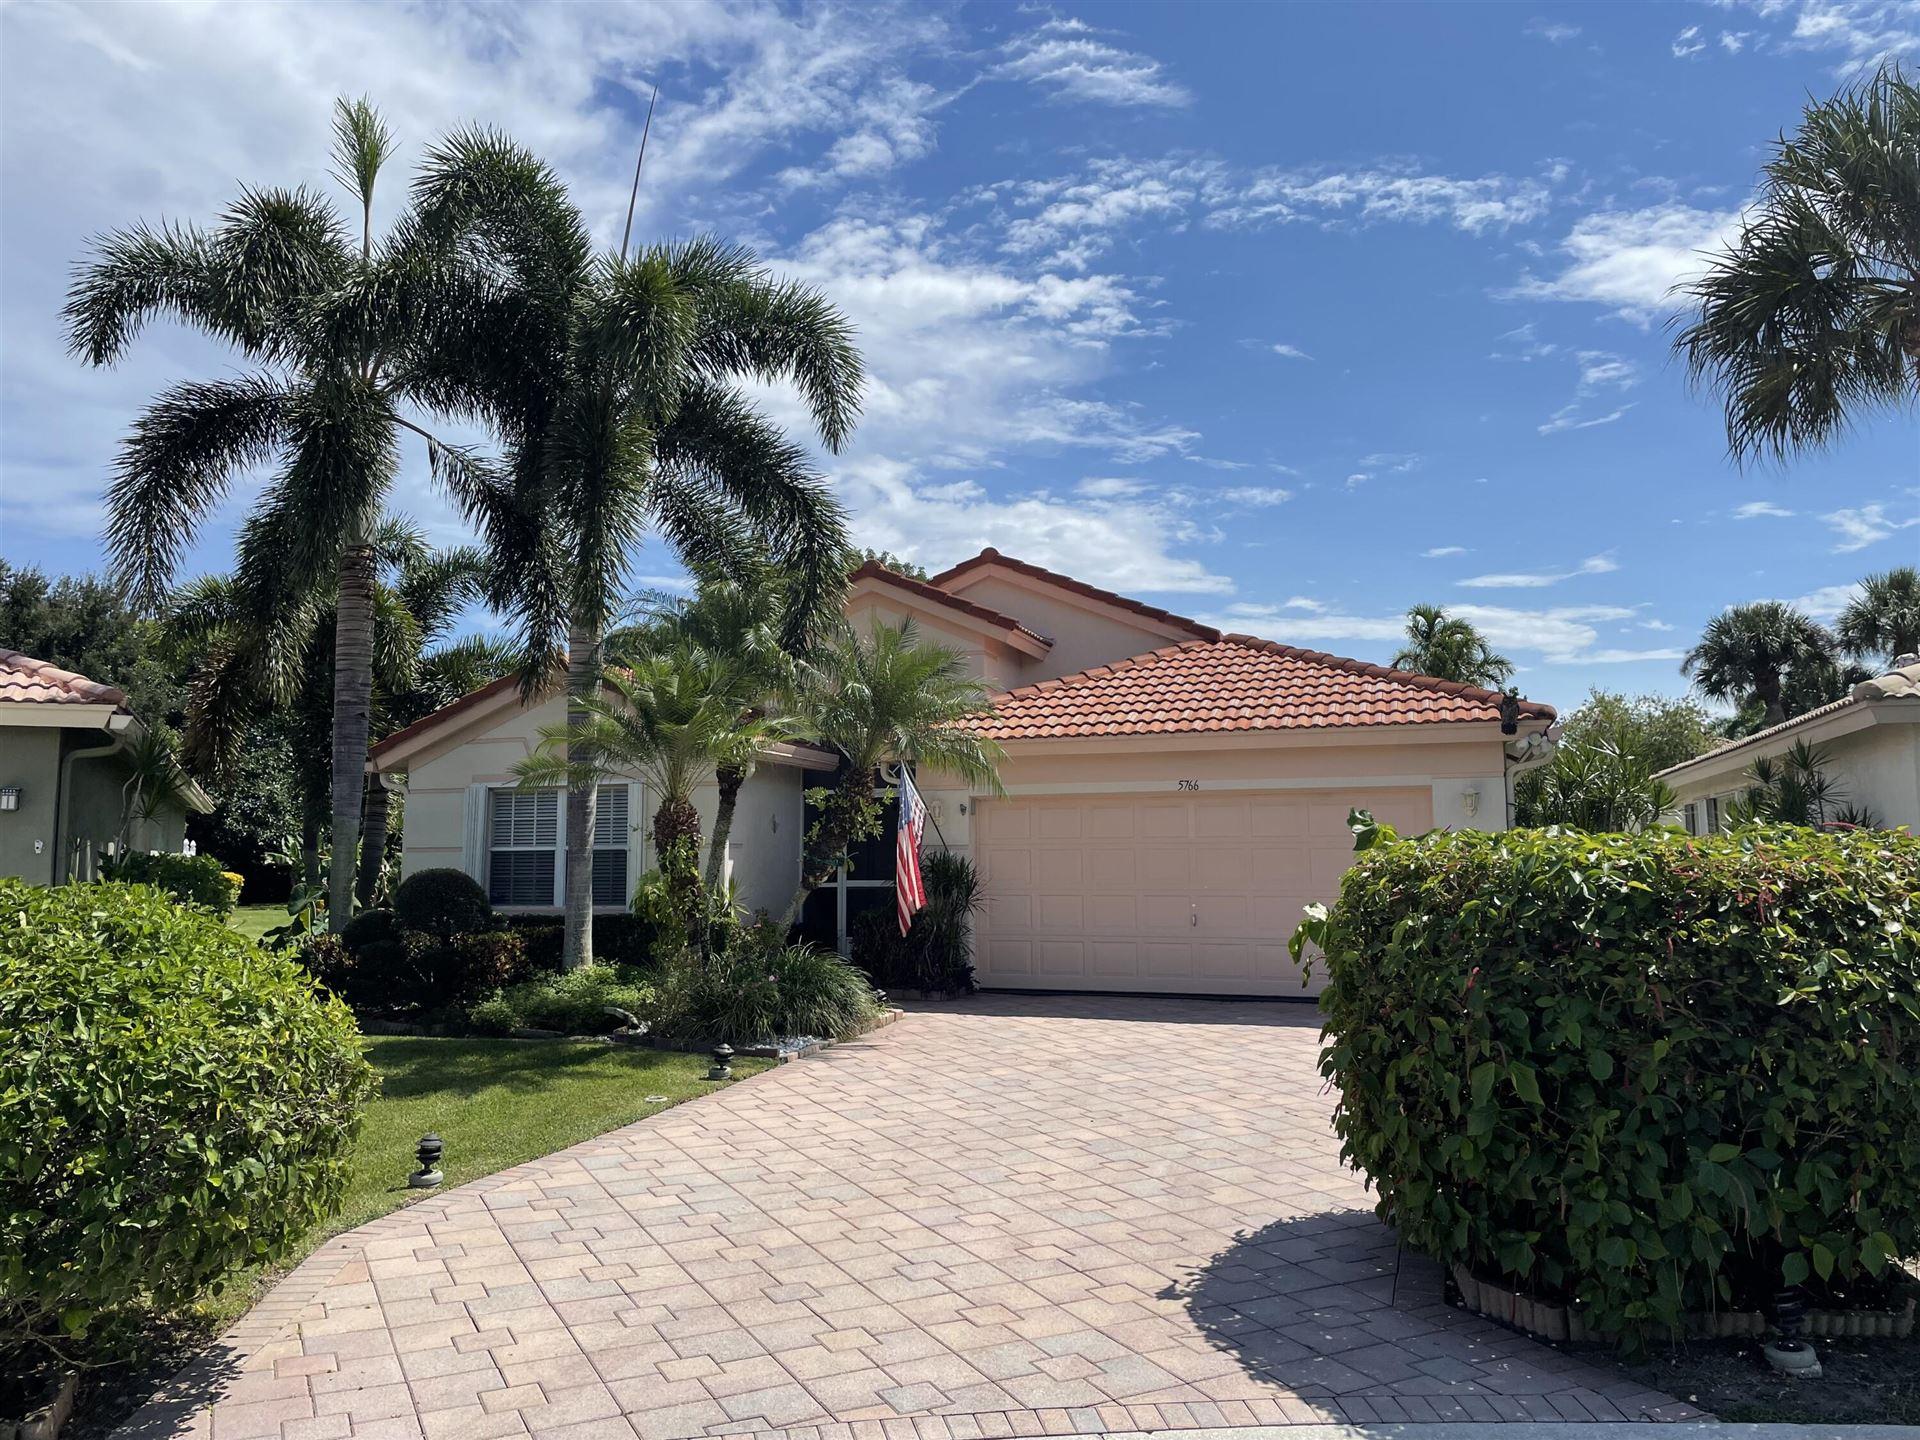 5766 Royal Club Drive, Boynton Beach, FL 33437 - MLS#: RX-10746110